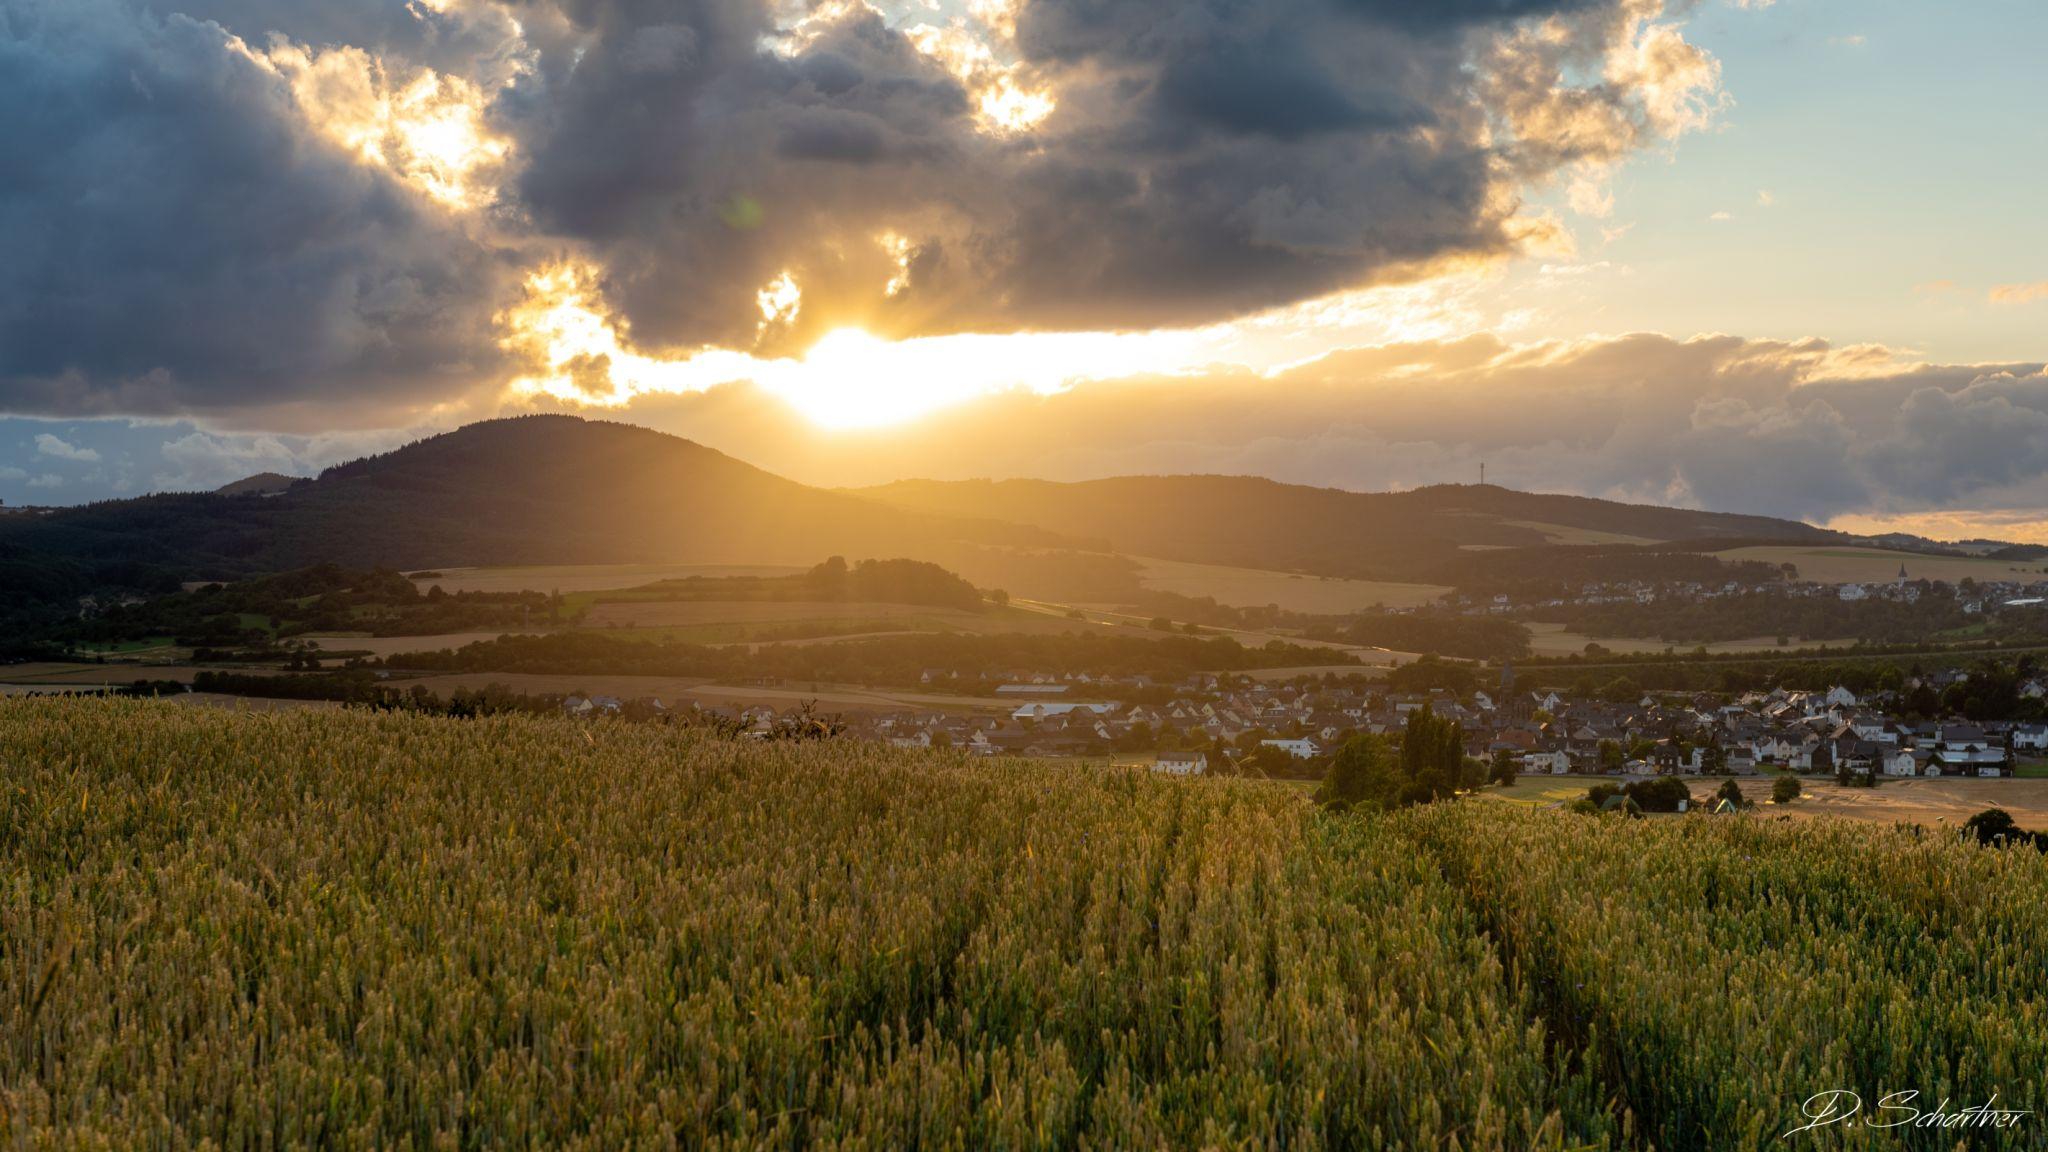 Sunset in Thür, Germany